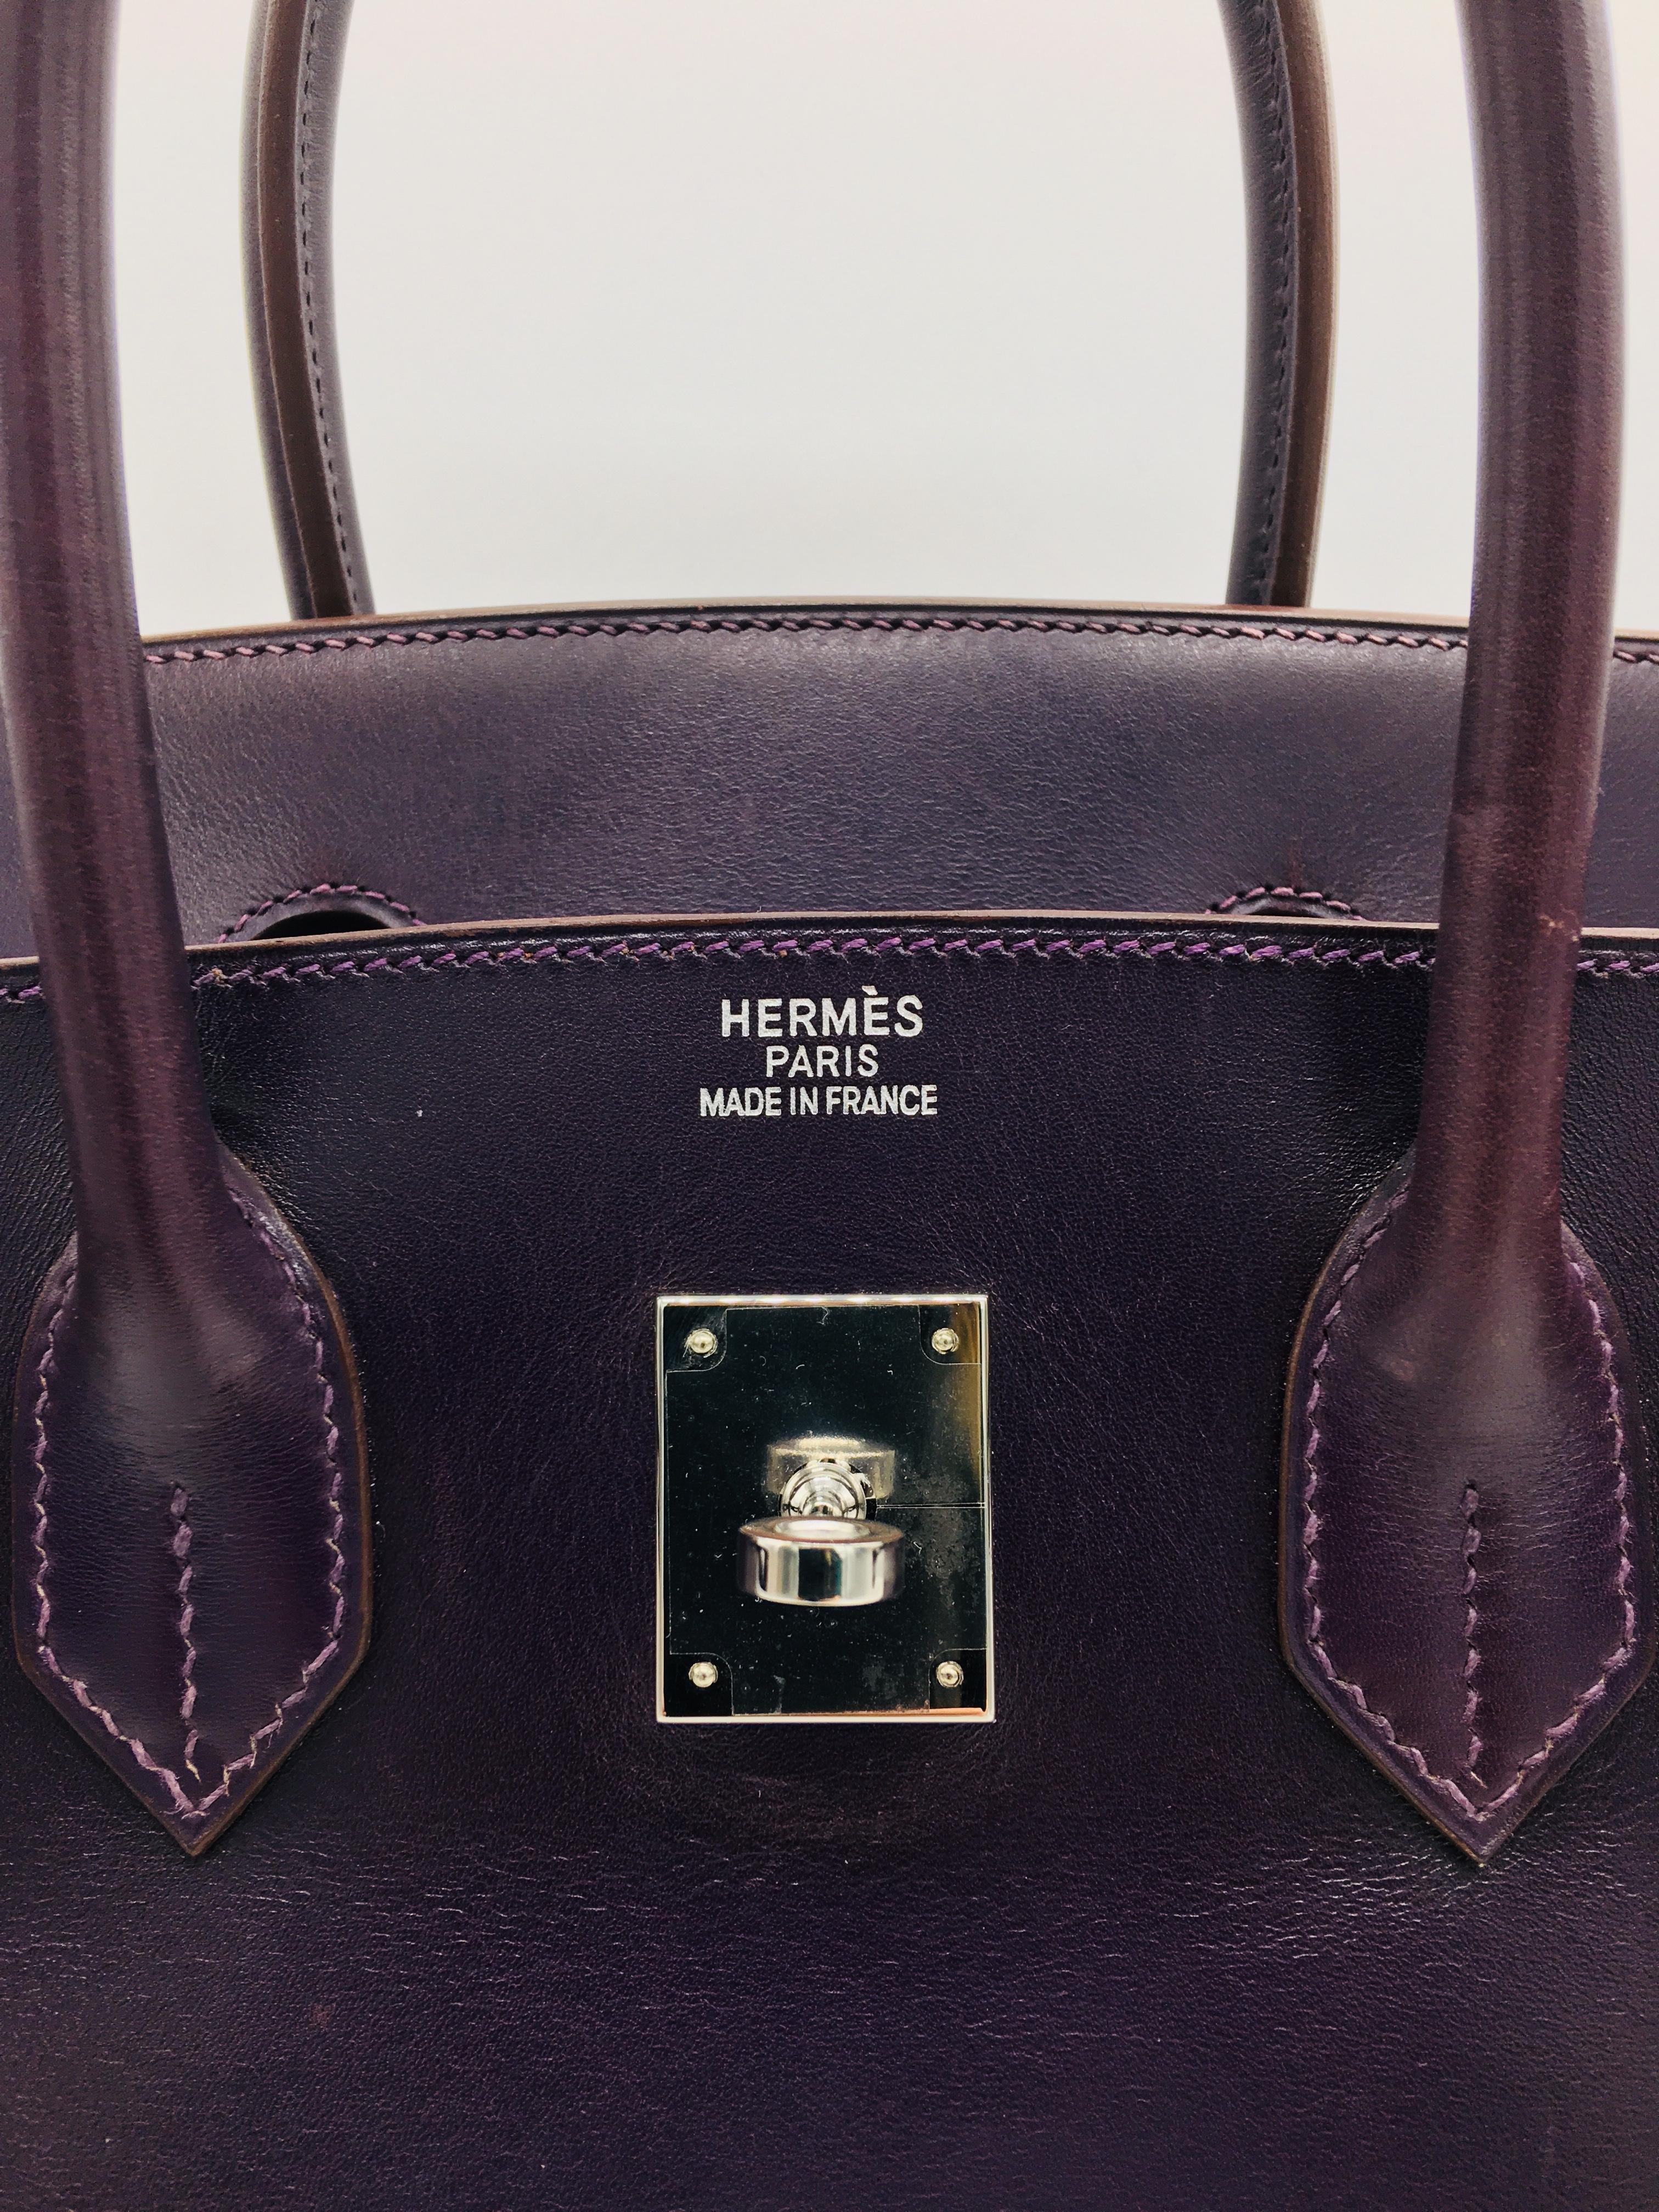 2f31f33f0b05 Hermes preloved Raisin   Anemone Birkin 35cm For Sale at 1stdibs